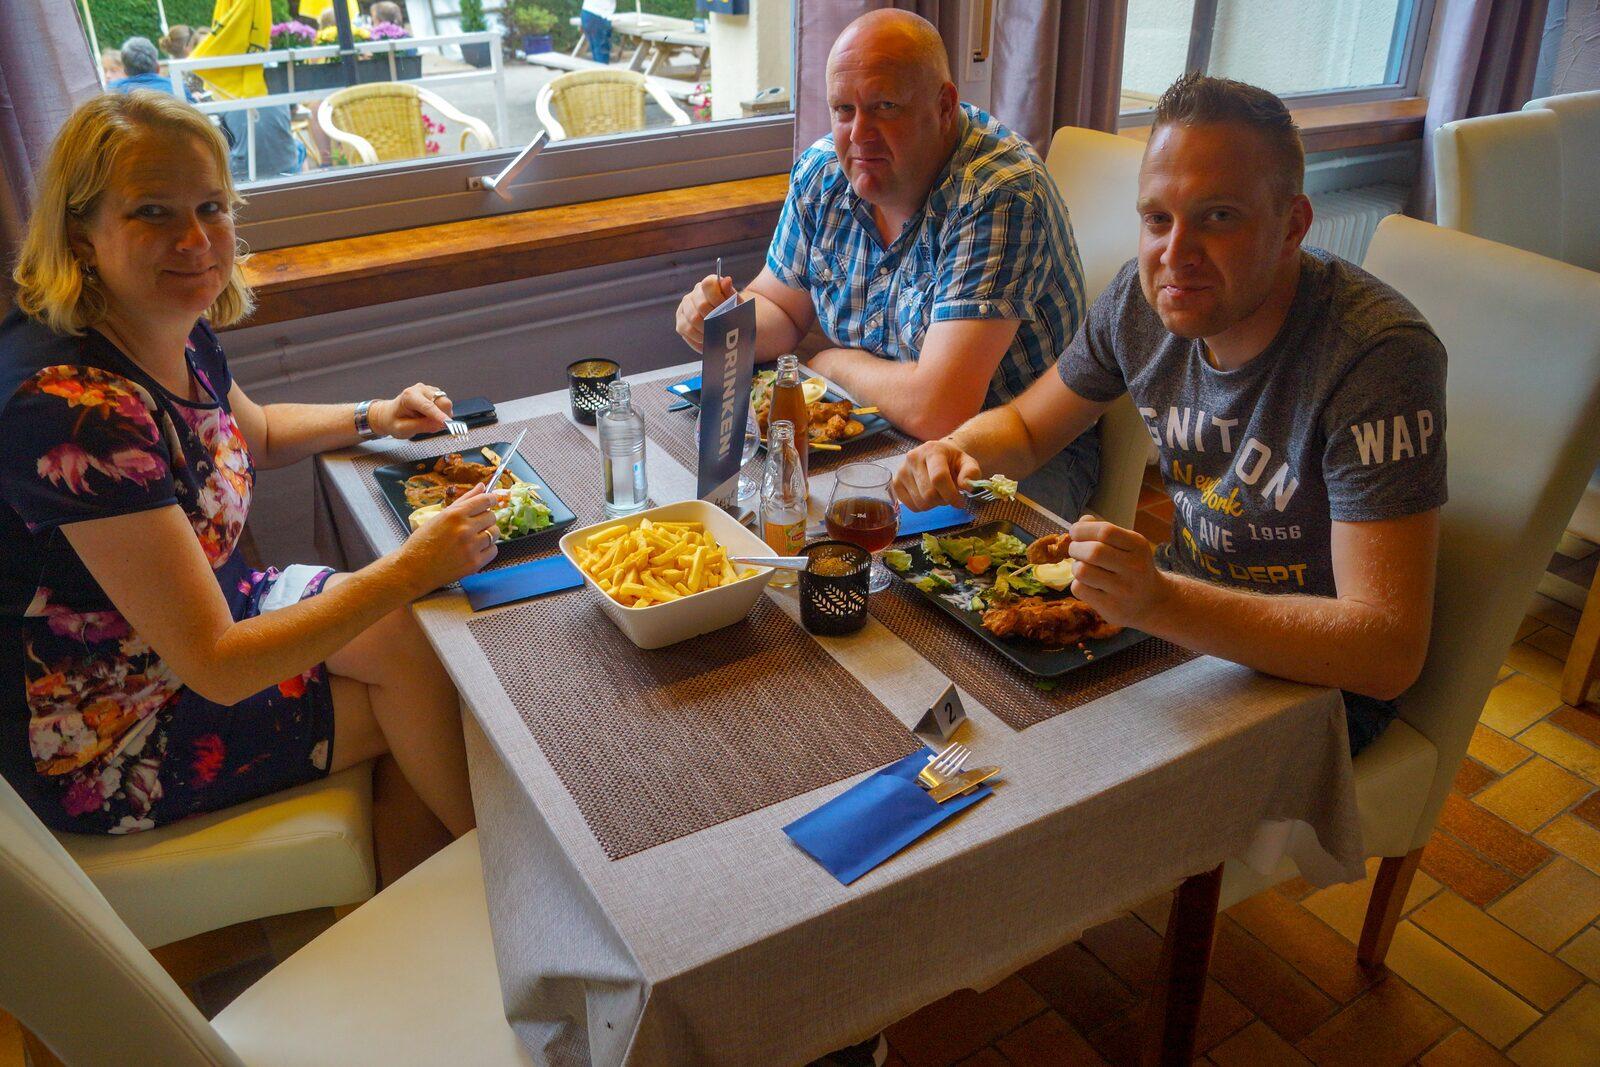 Diner restaurant Walsdorf